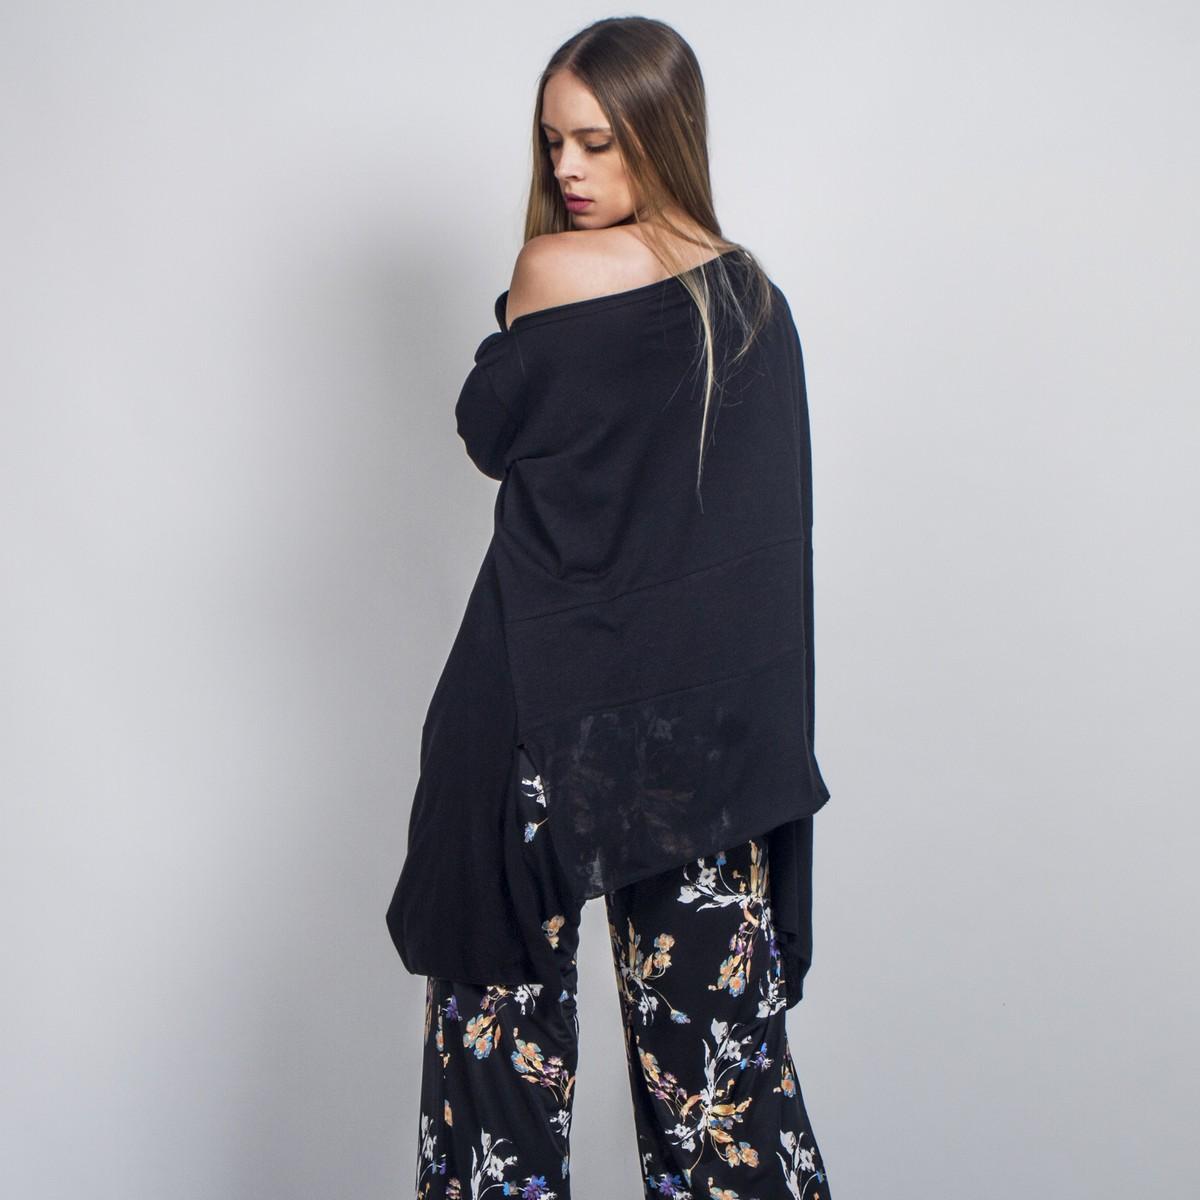 f8b7379c8af3 Φαρδιά ασύμμετρη μπλούζα με τσέπες - Γυναικεία Ρούχα - Φορέματα ...